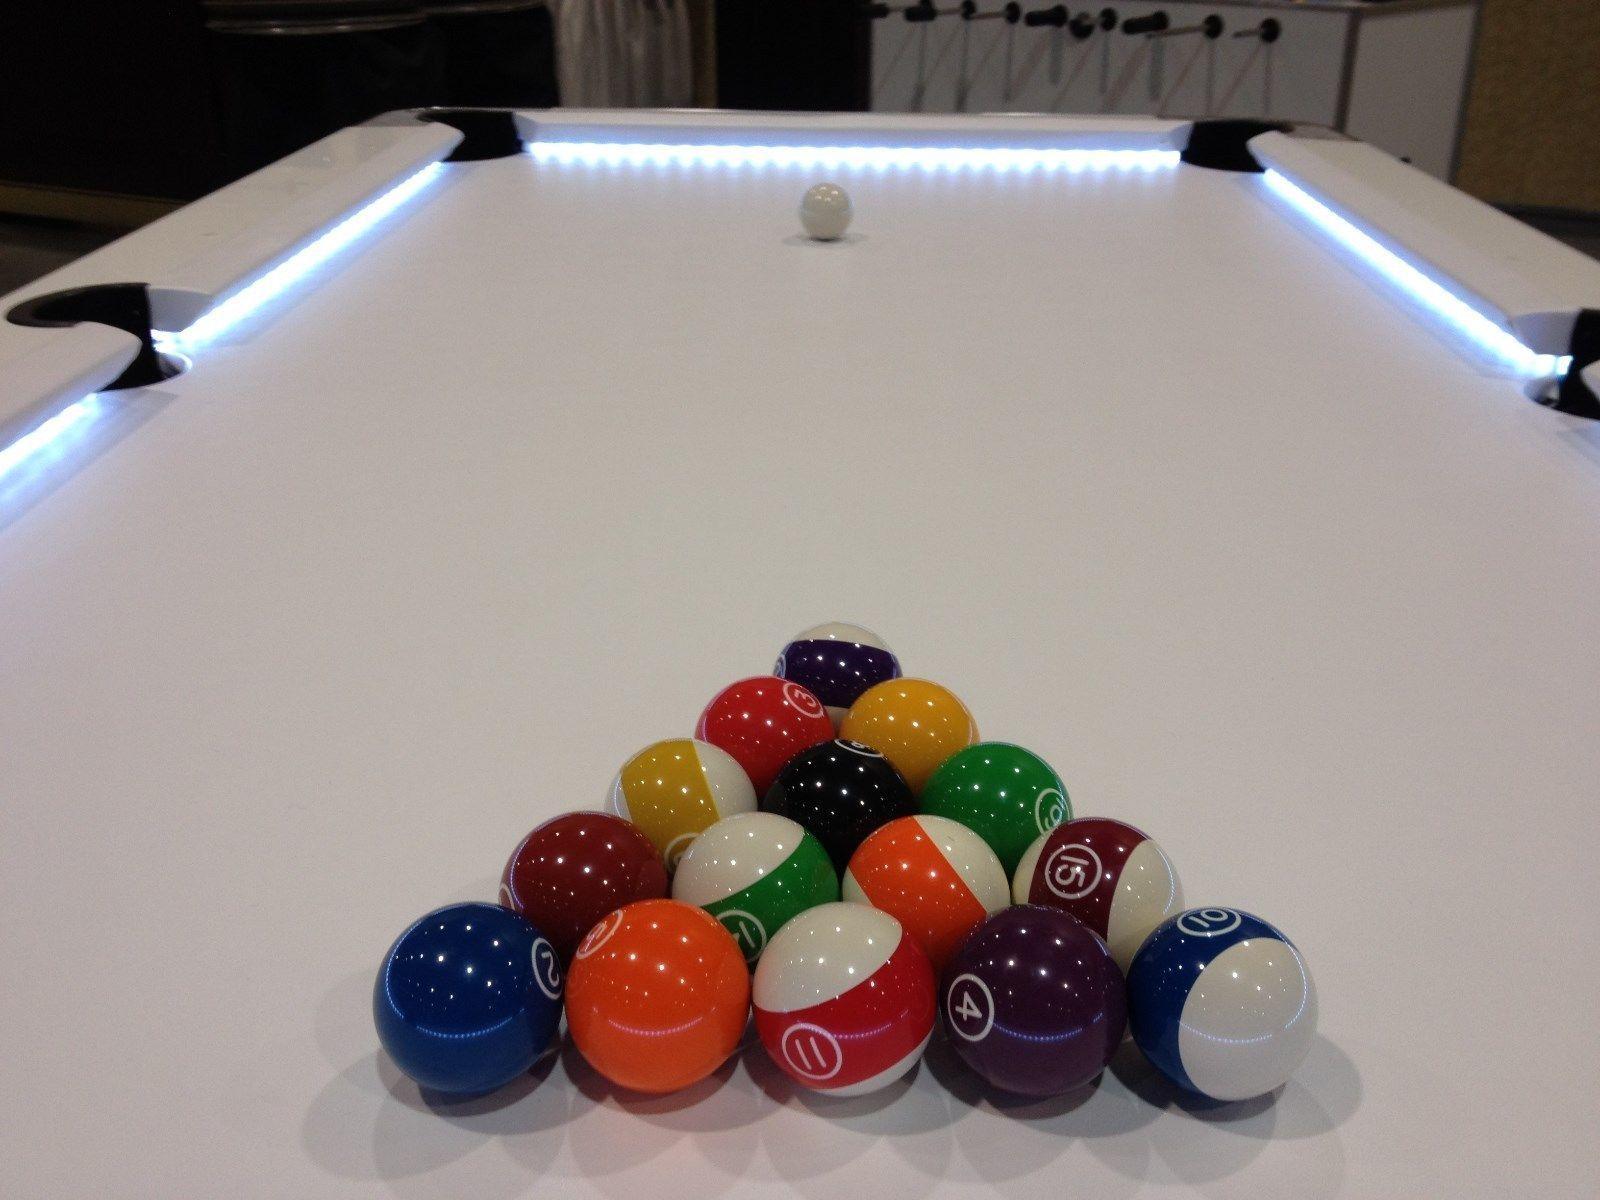 LED Pool & Billiard Table Lighting KIT light your JD